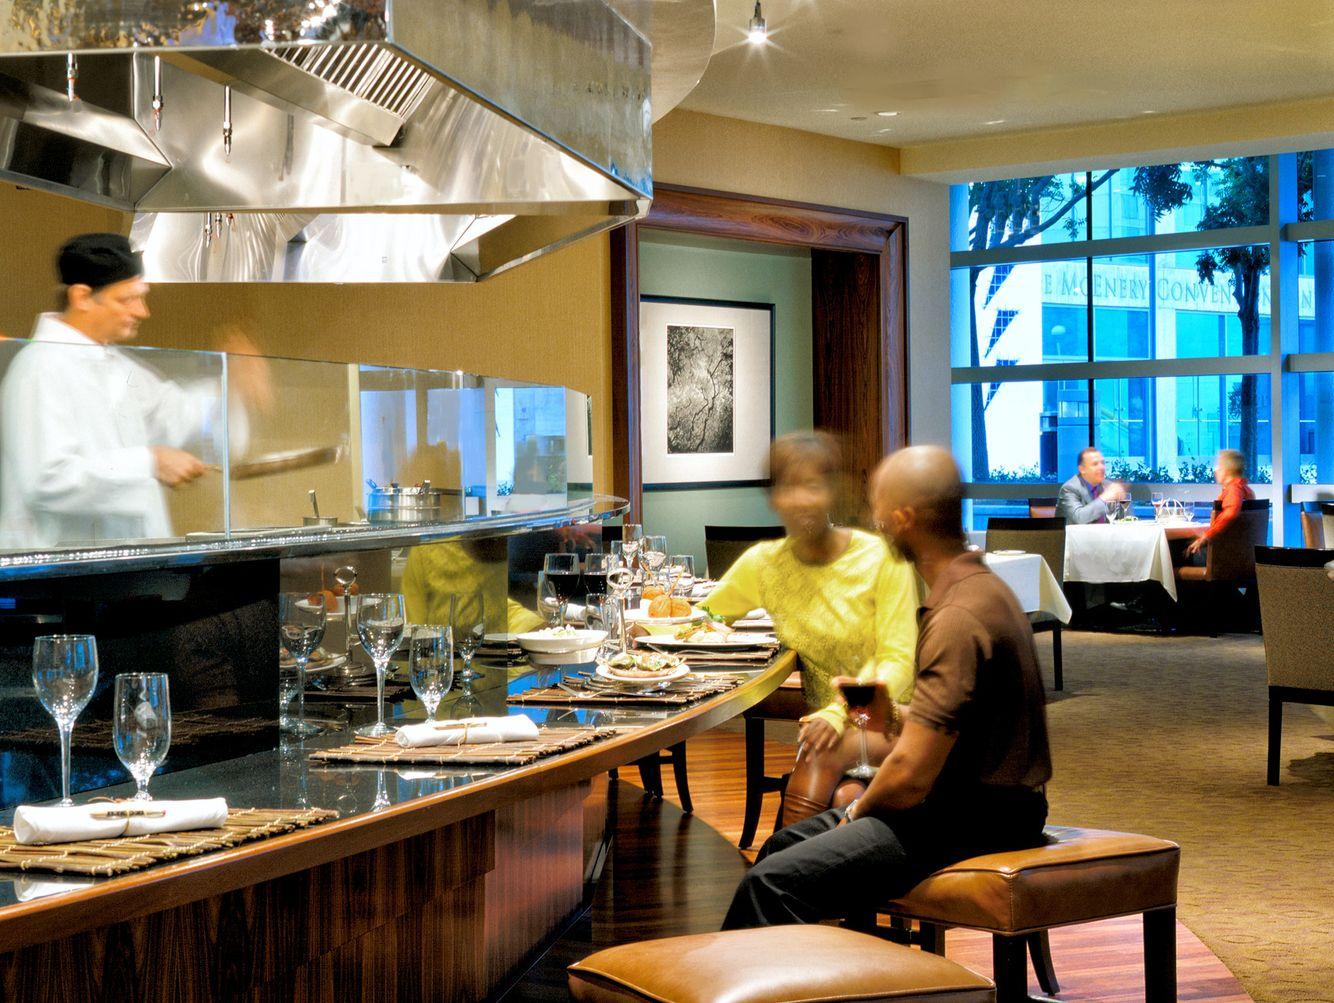 John-Sutton-Photography Arcadia Restaurant